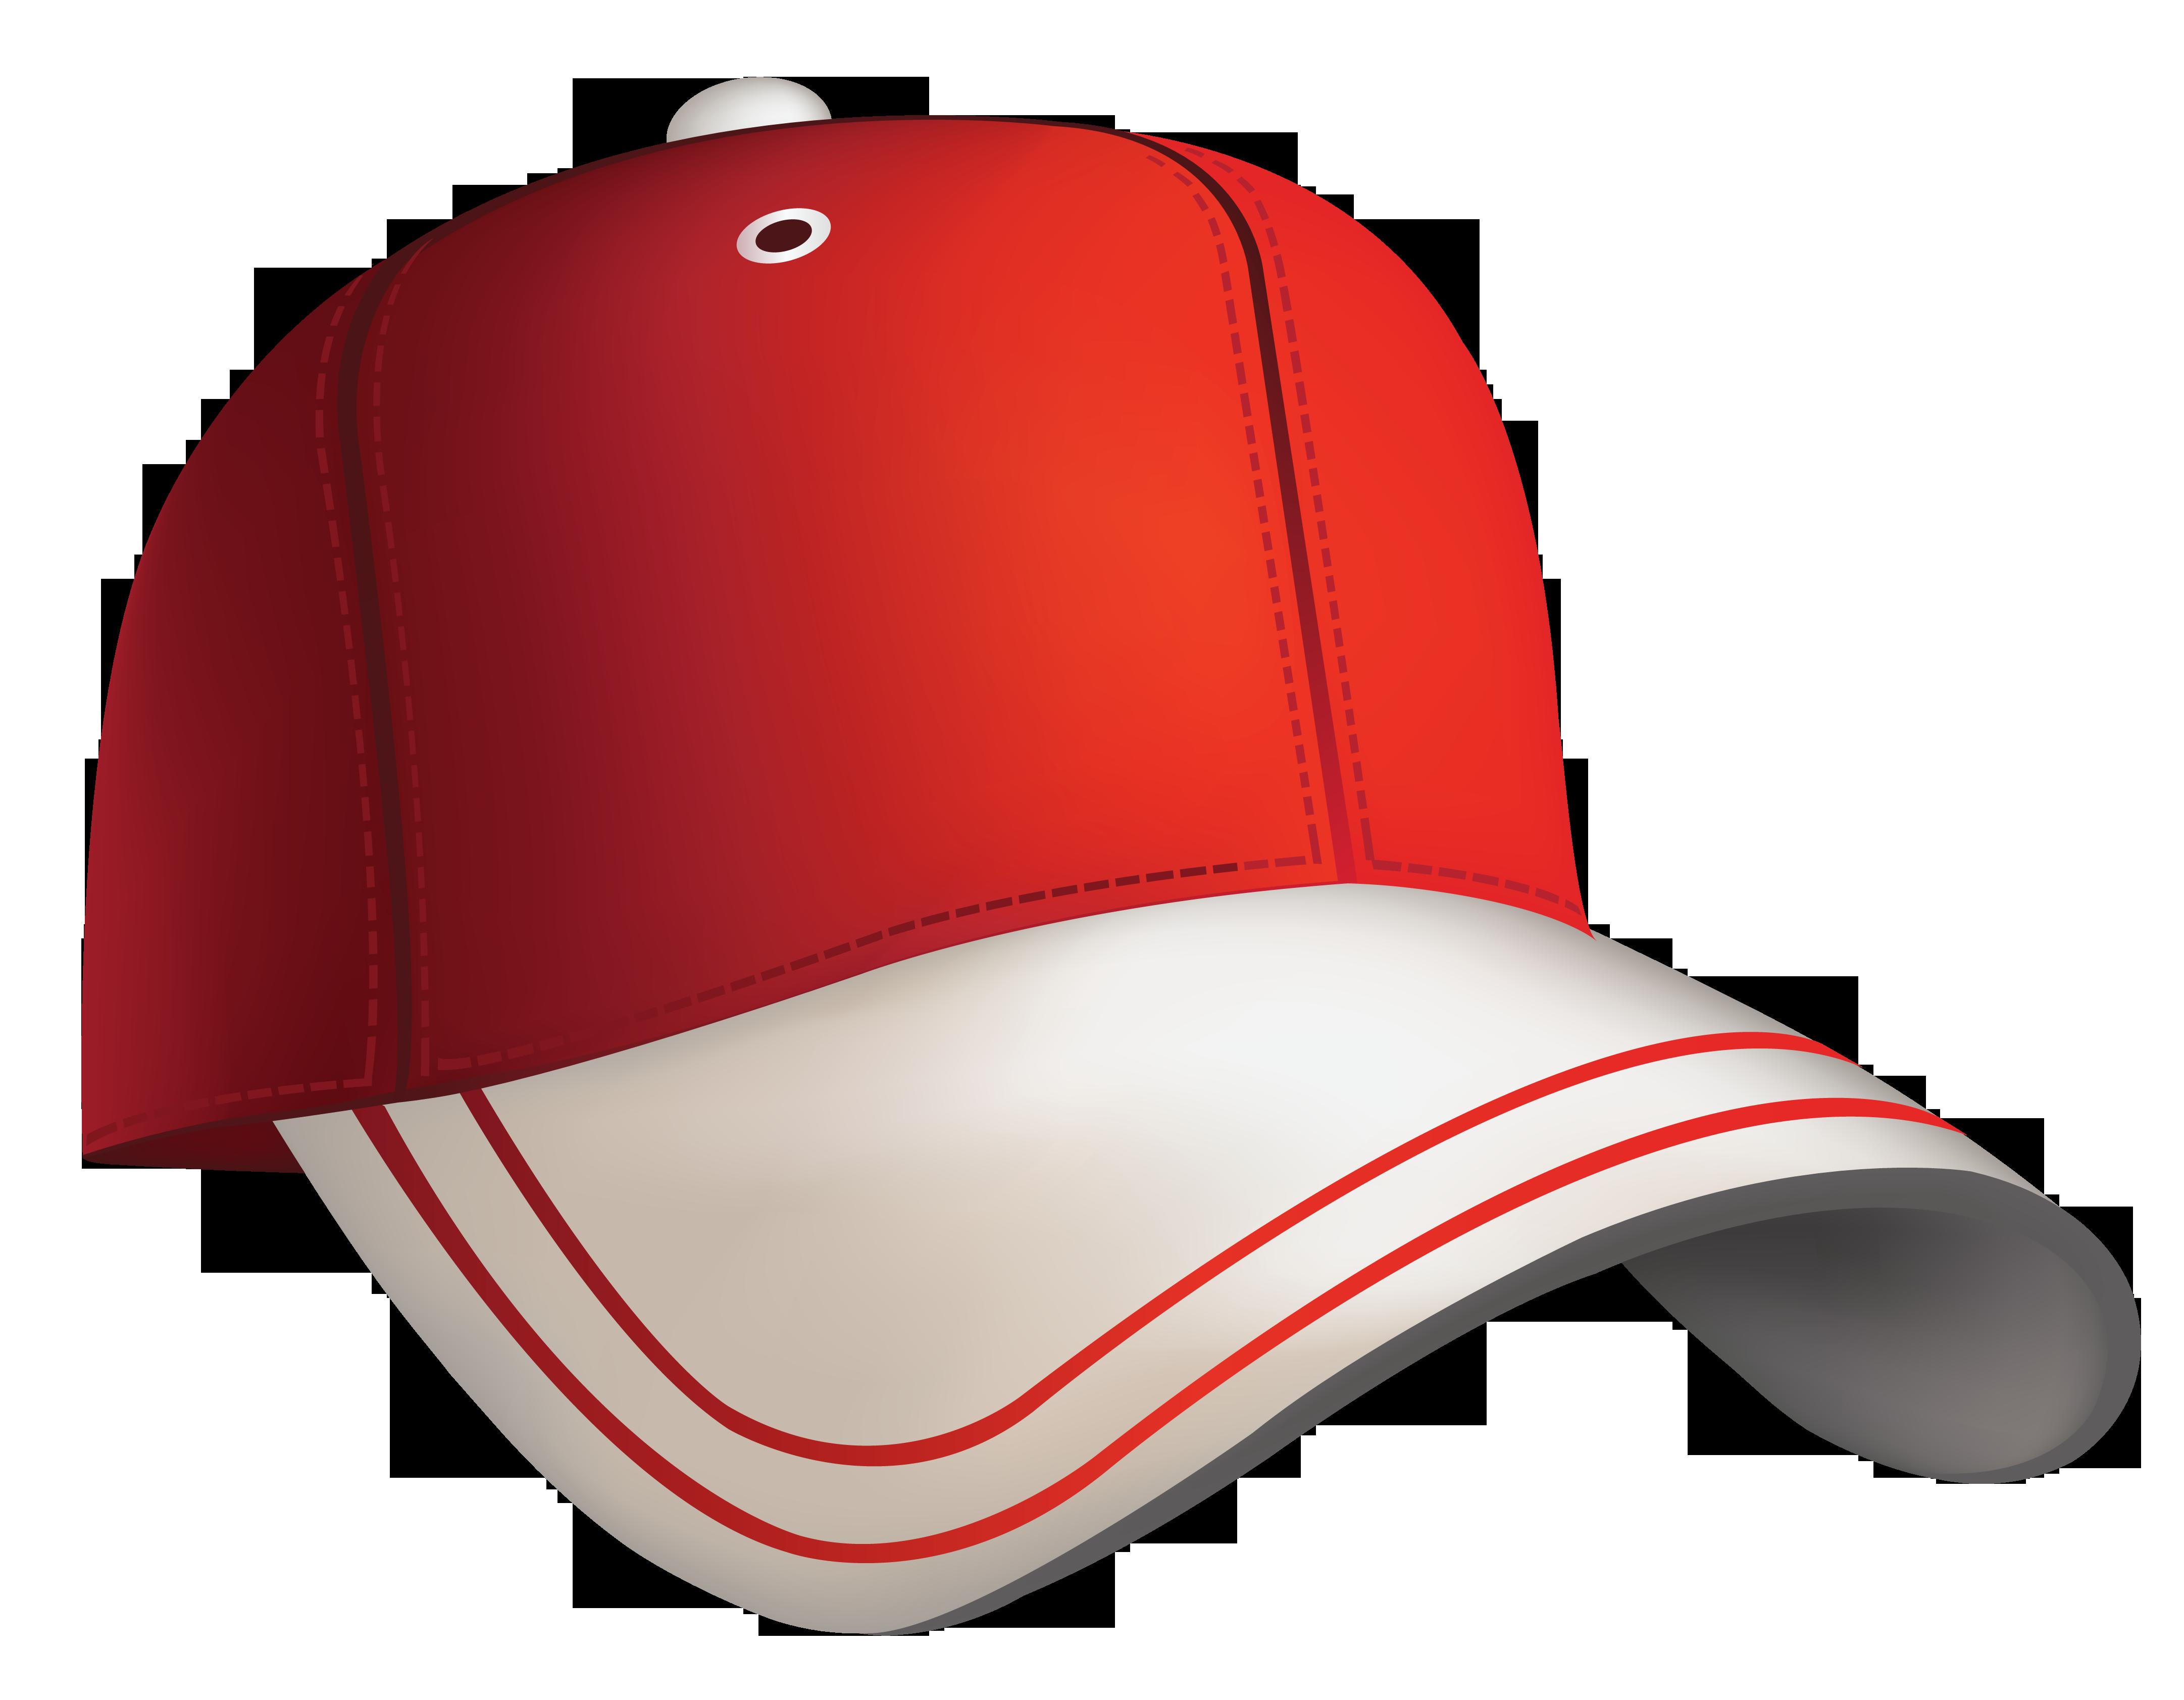 Download Png Image Baseball Cap Png Image